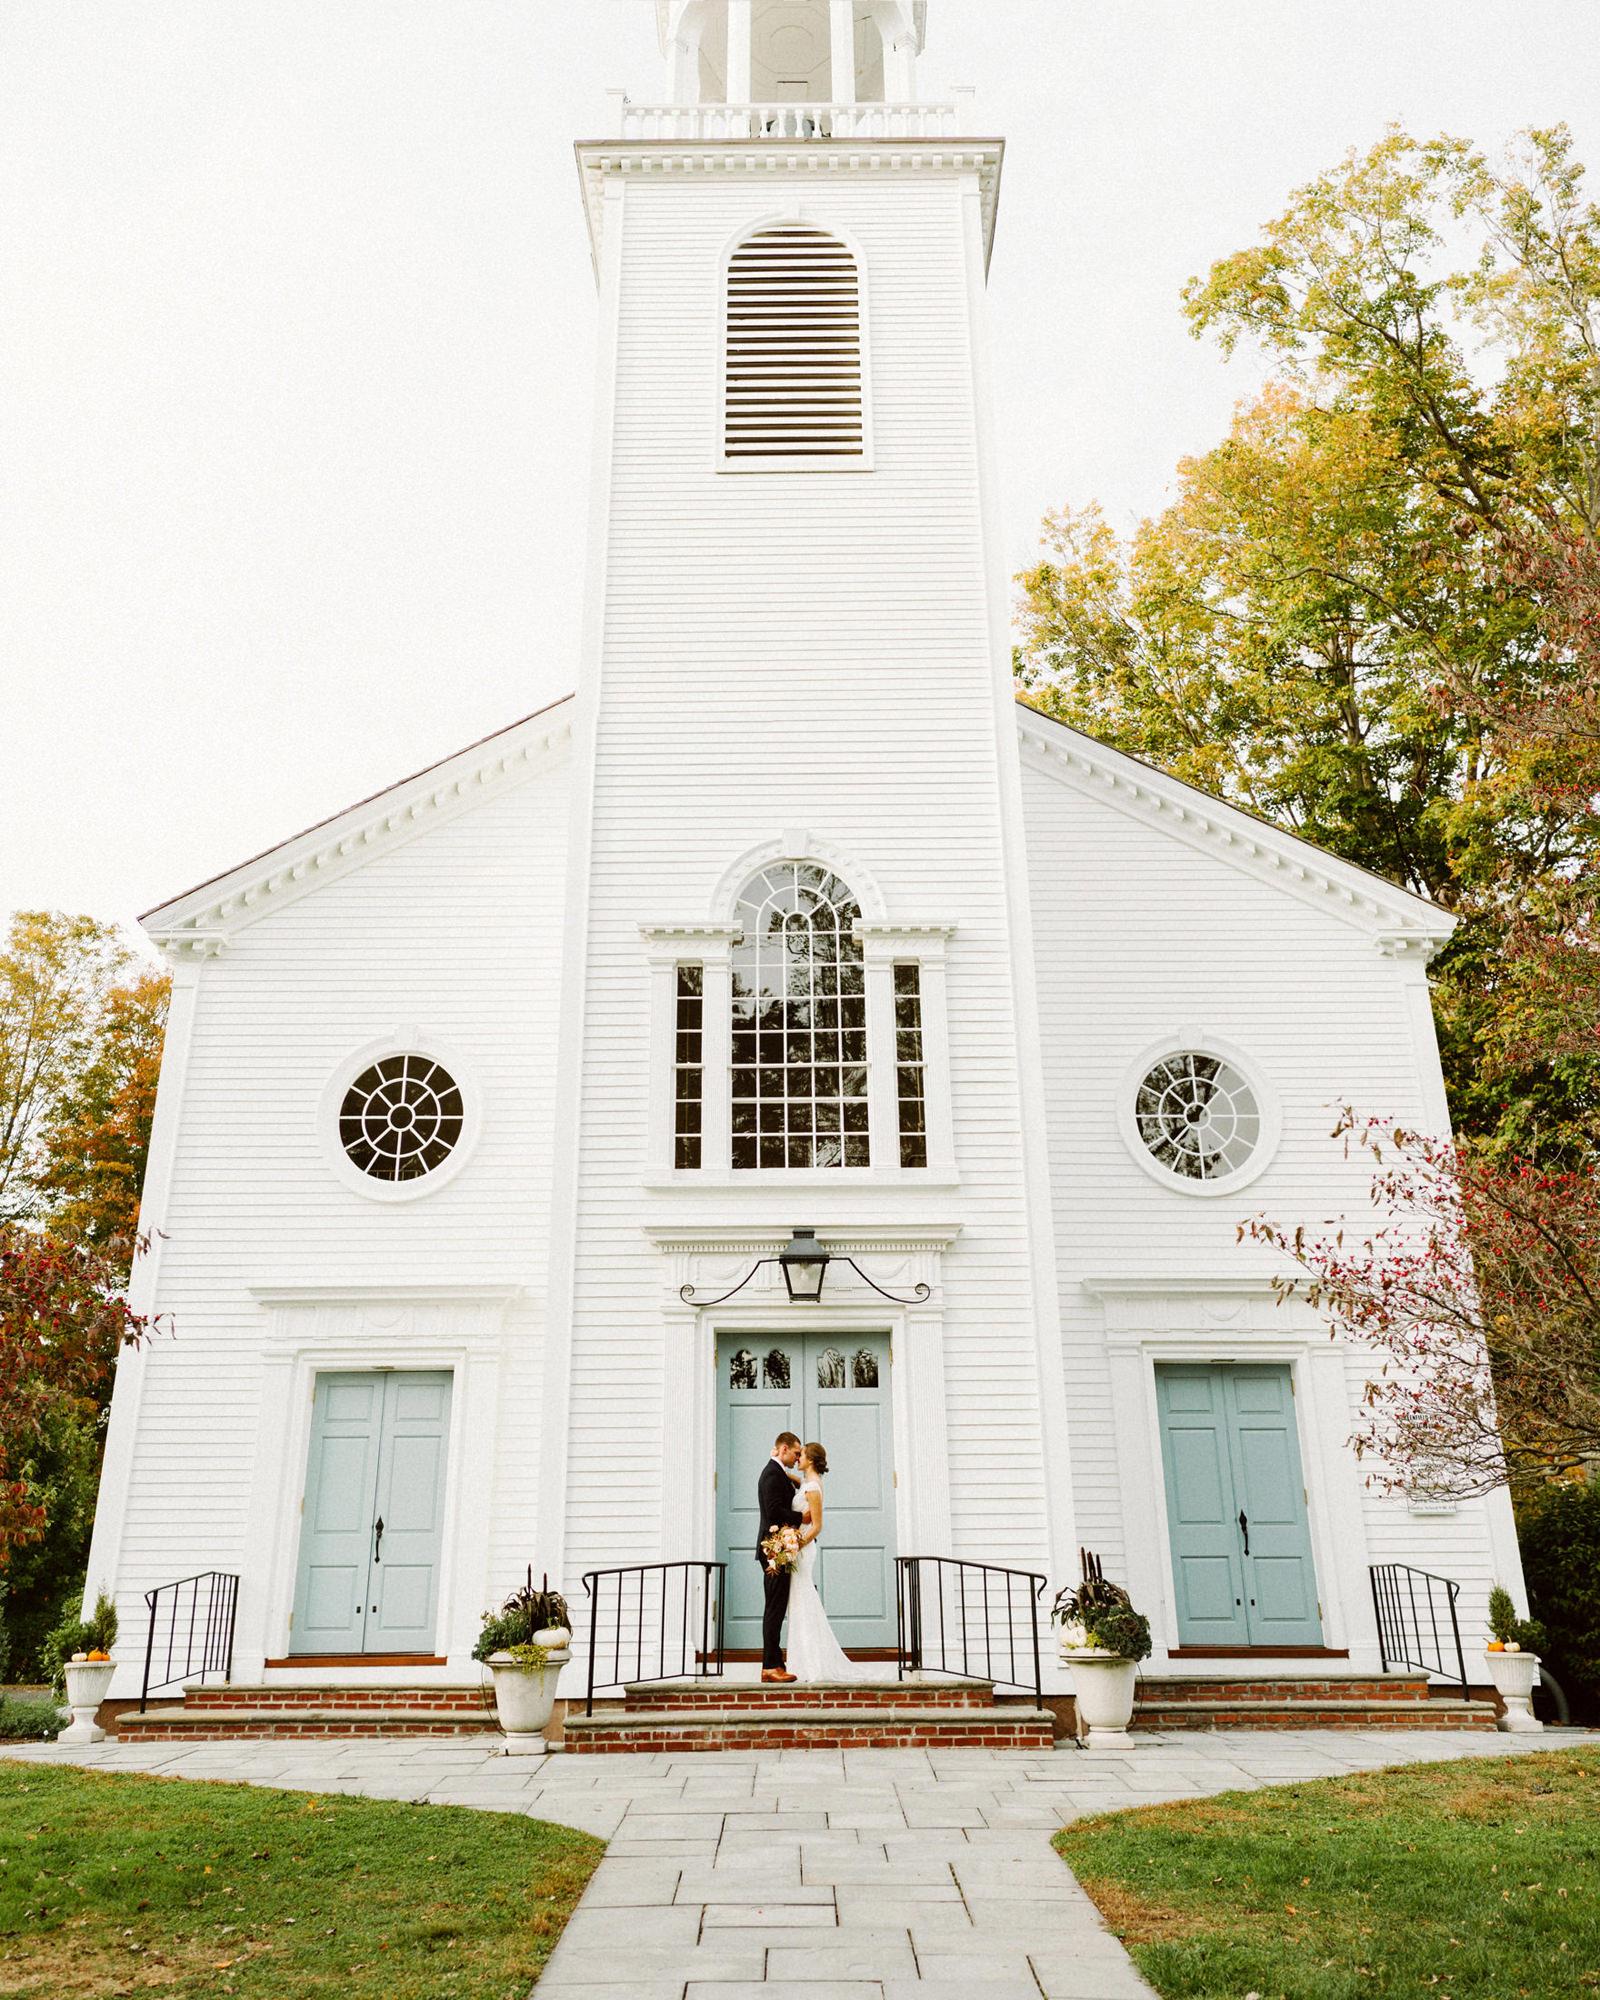 bridgeport-wedding-091 BRIDGEPORT, CONNECTICUT BACKYARD WEDDING